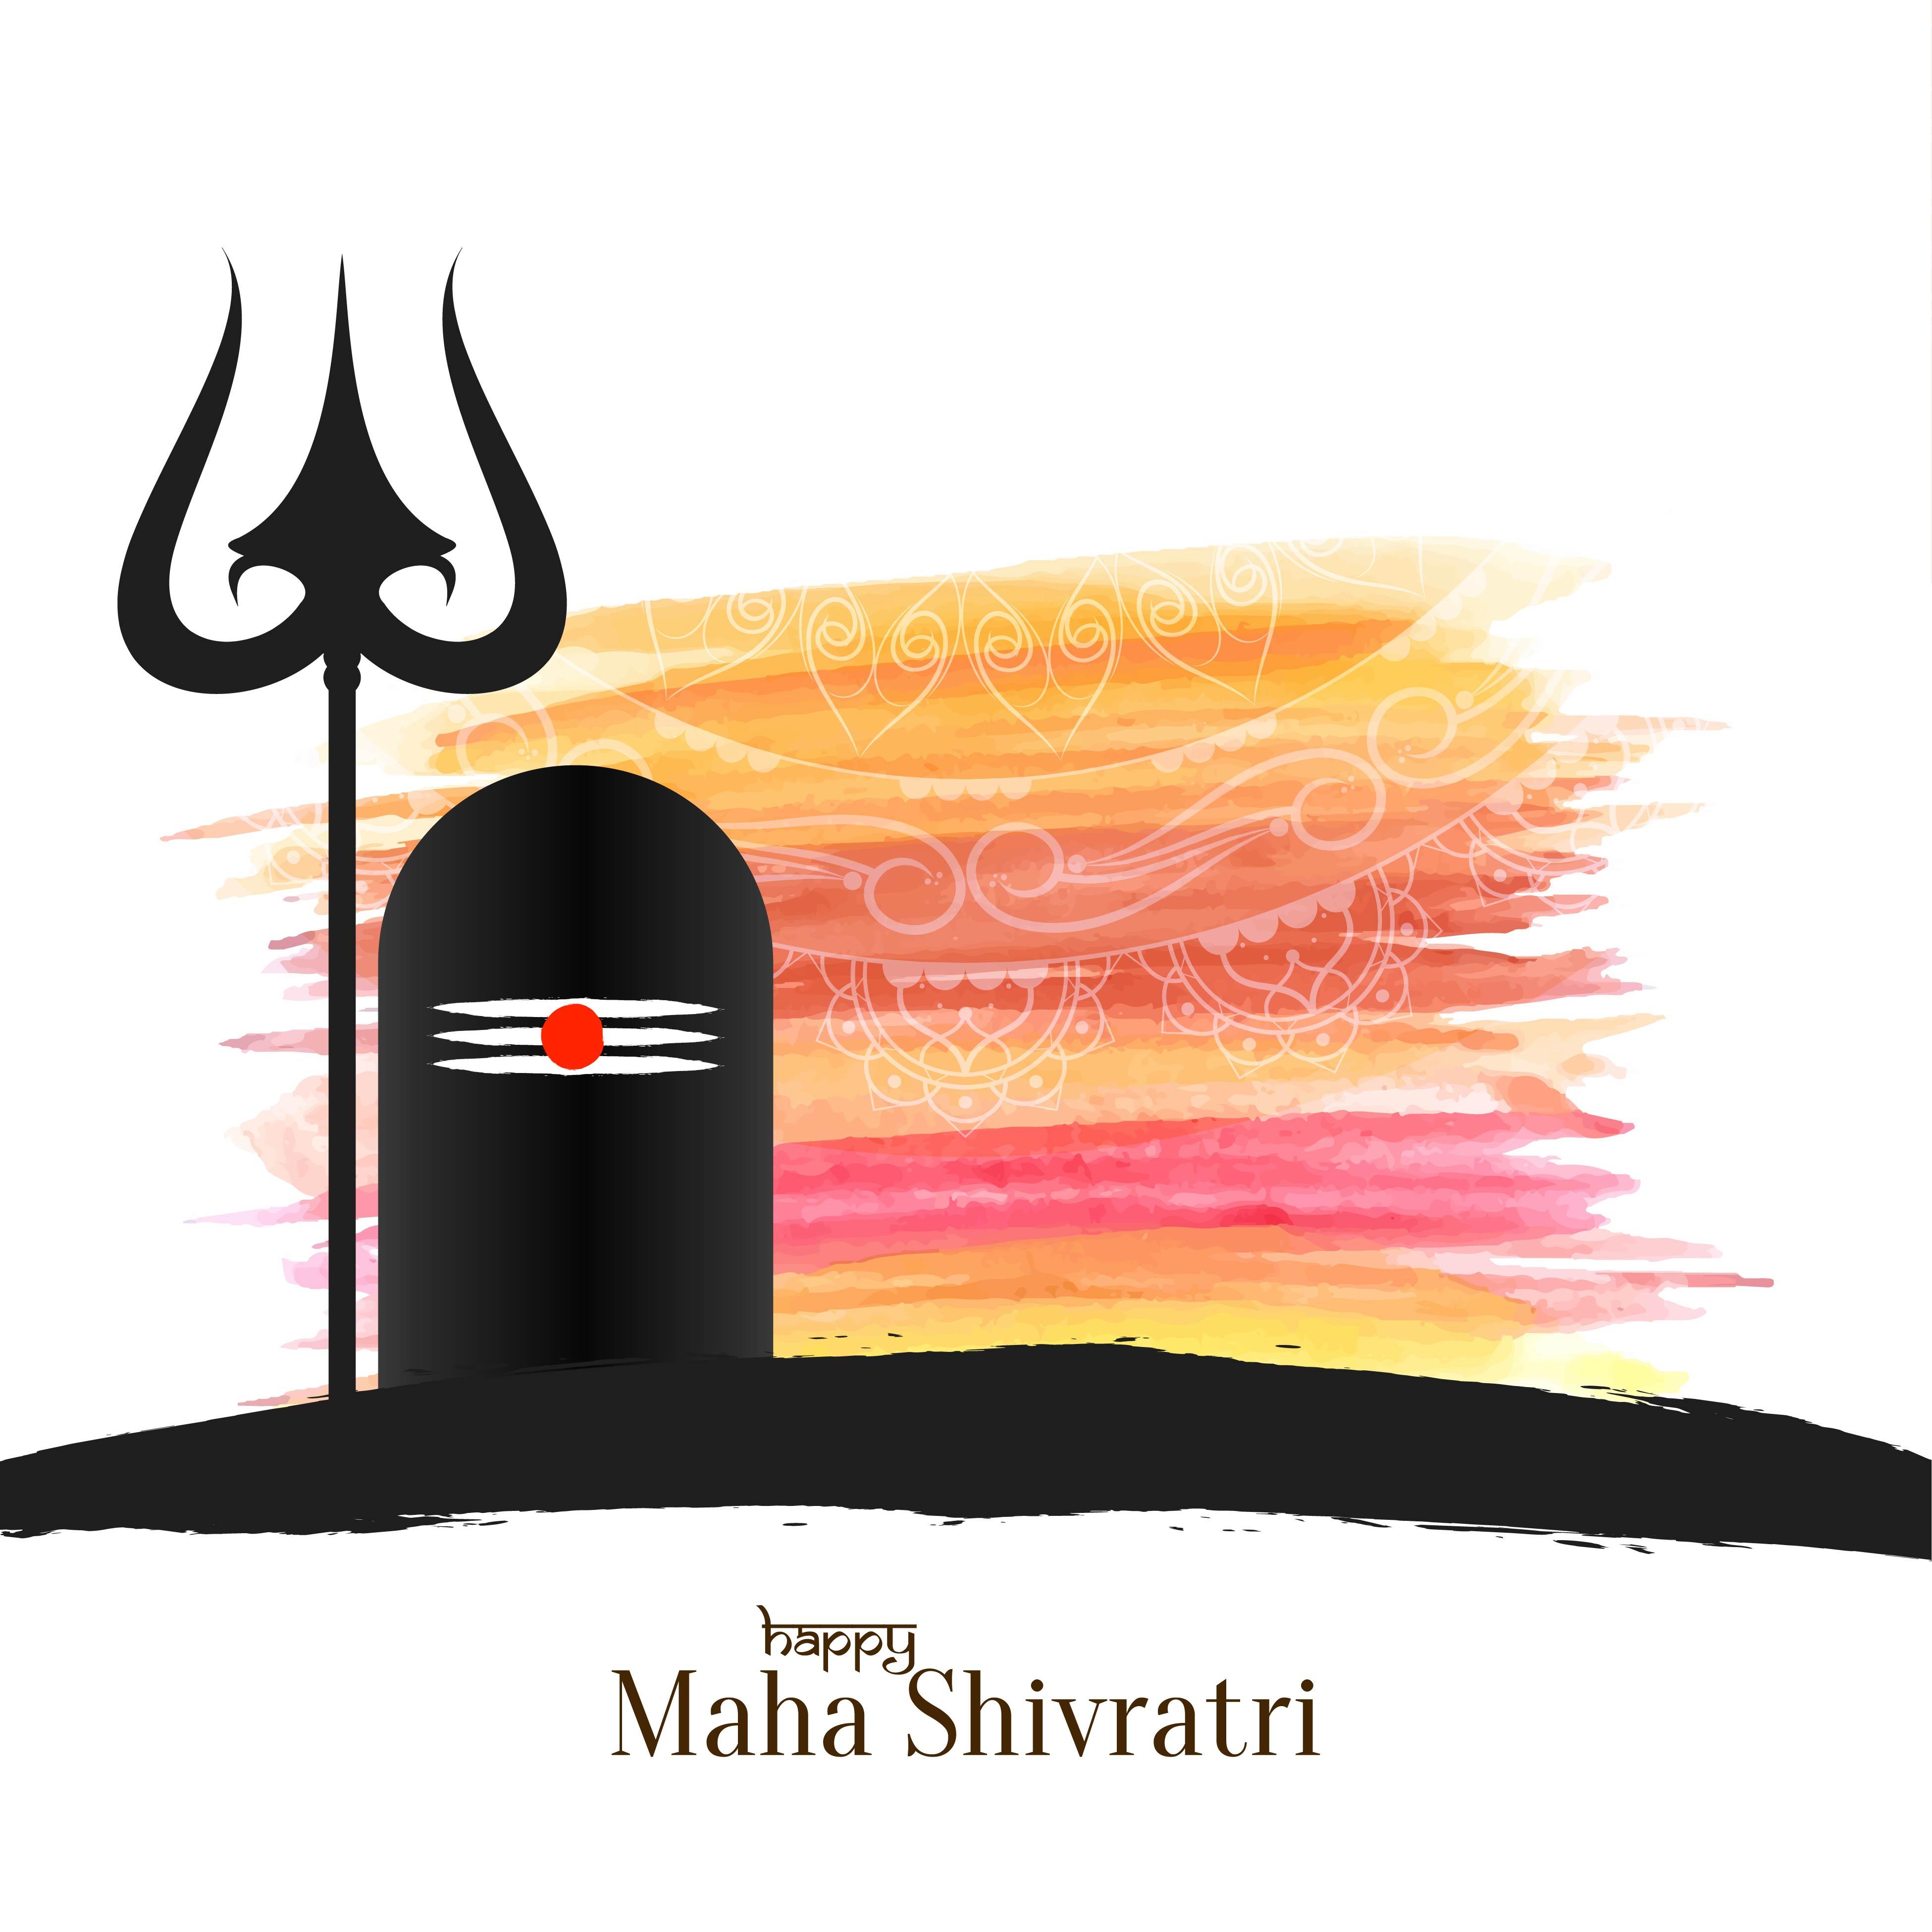 Maha Shivratri Free Vector Art.